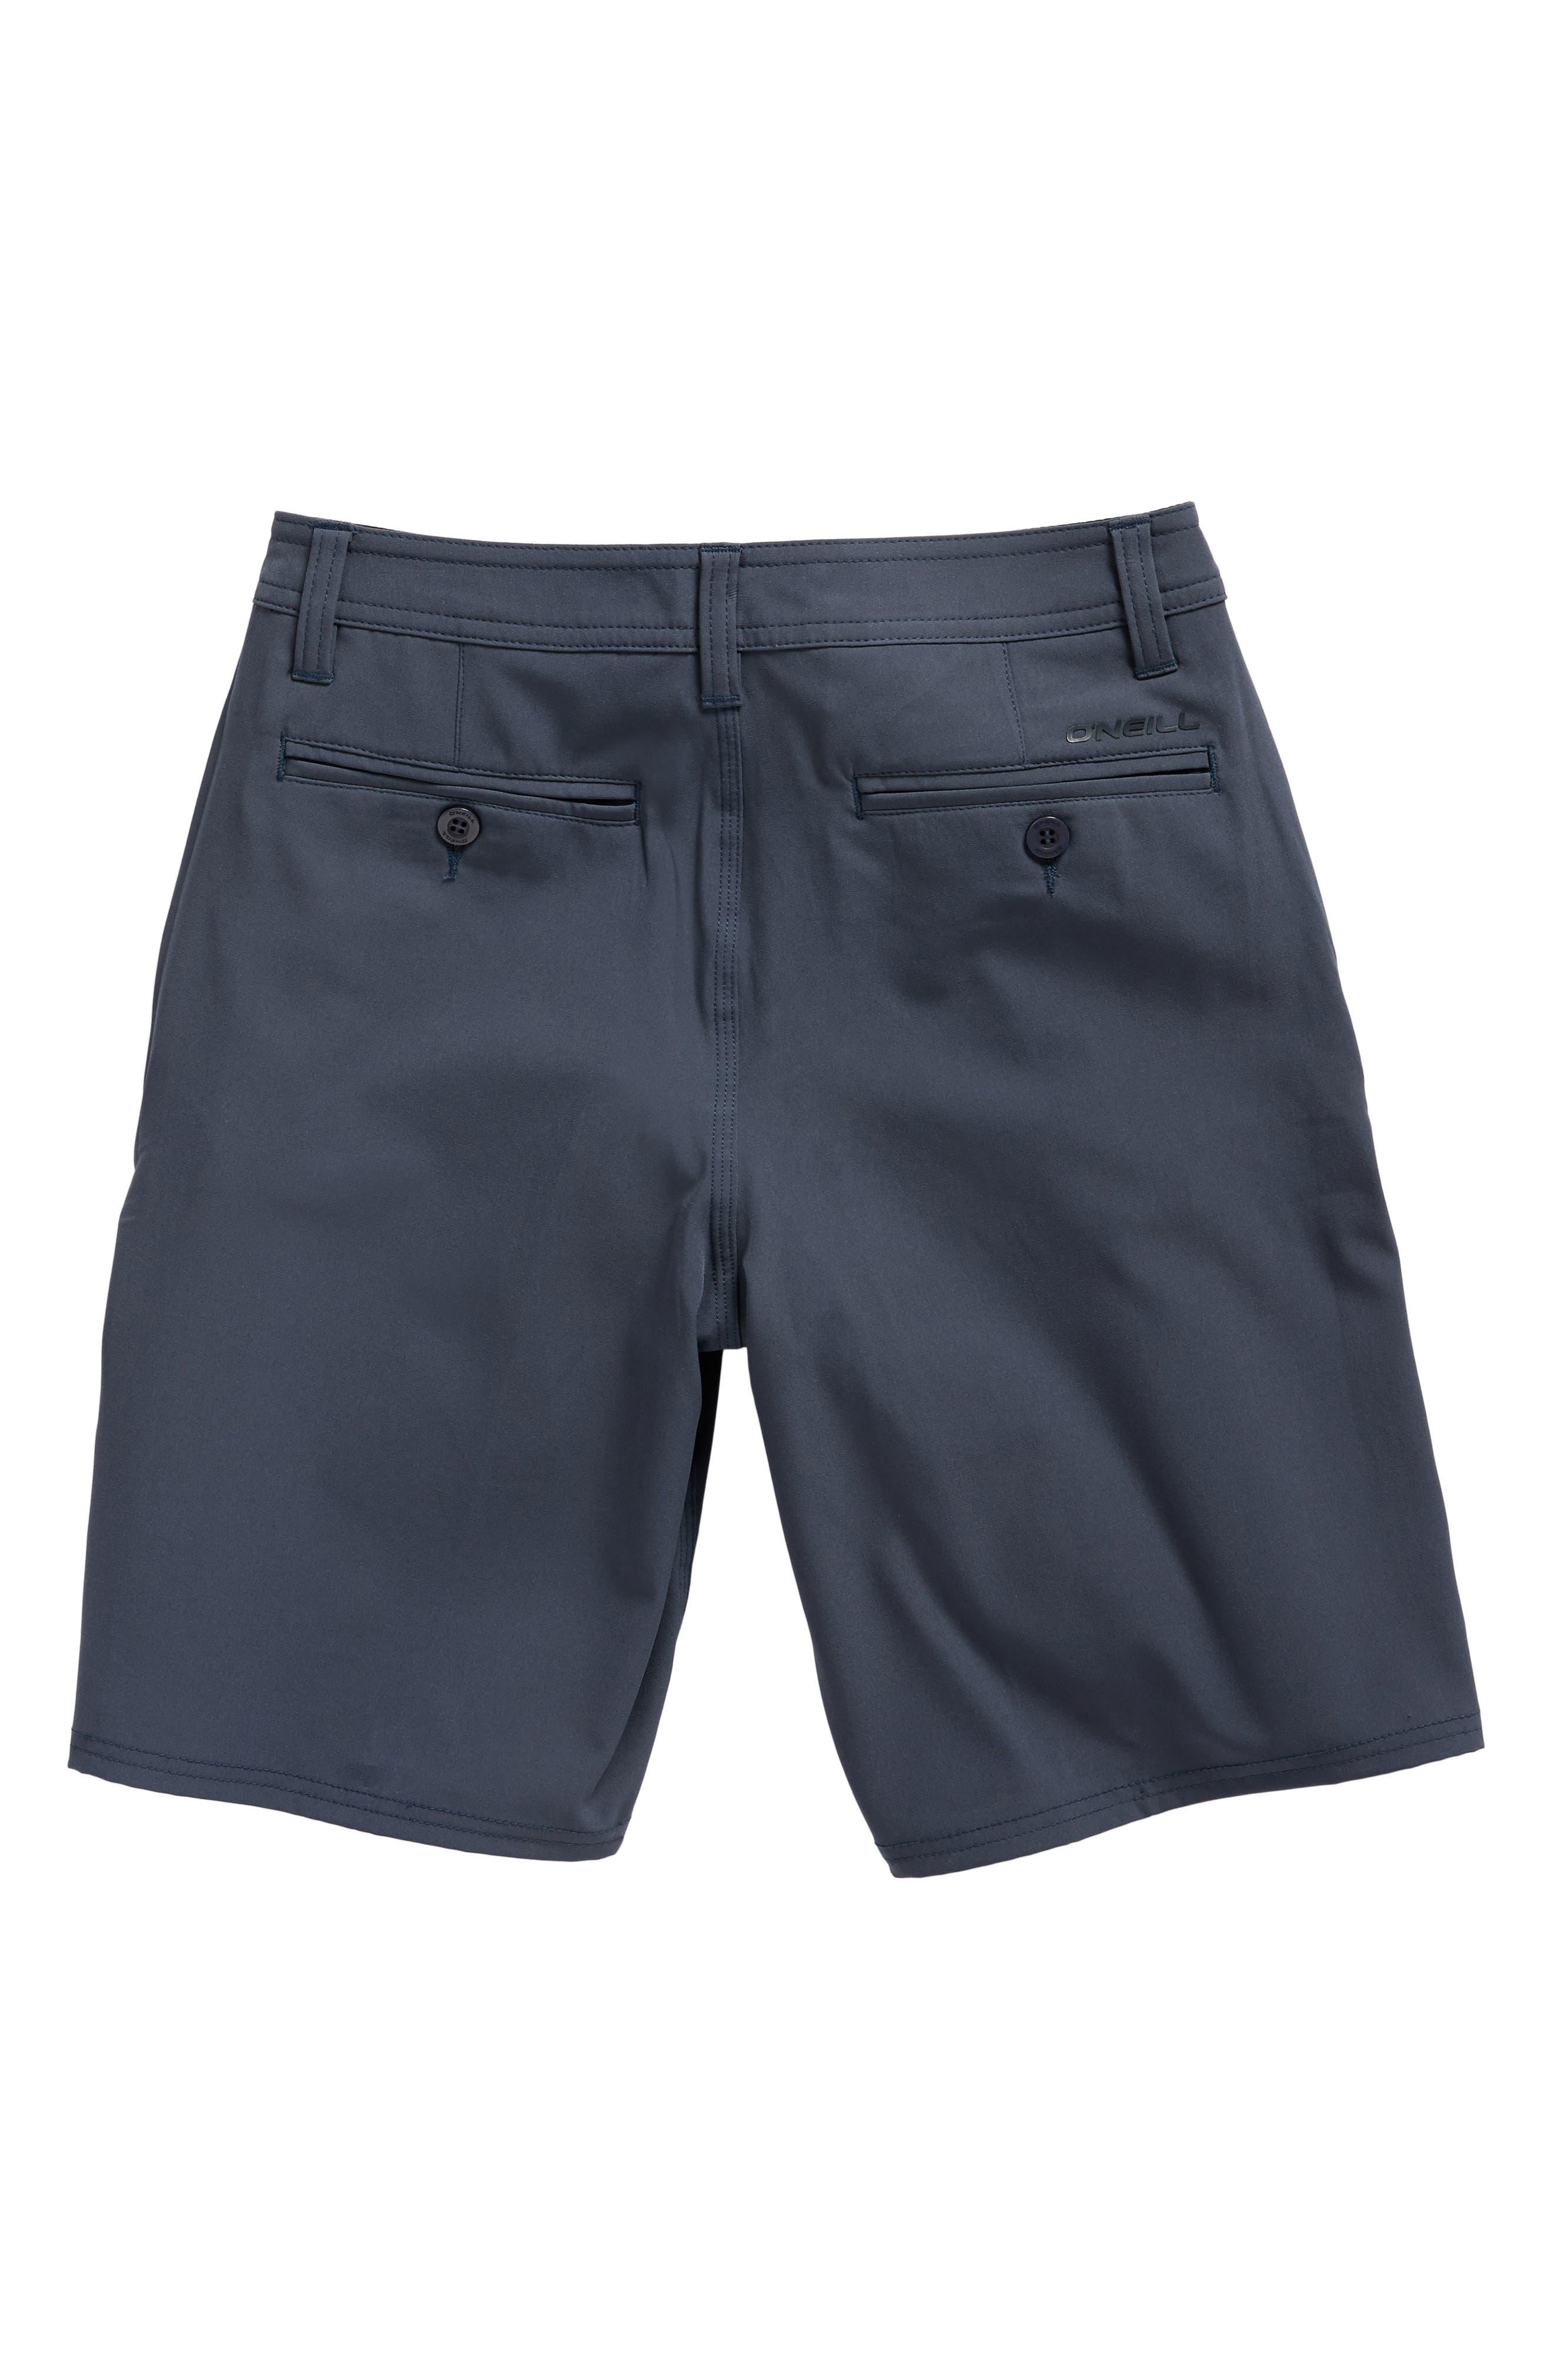 Loaded Hybrid Board Shorts,                             Alternate thumbnail 2, color,                             Slate